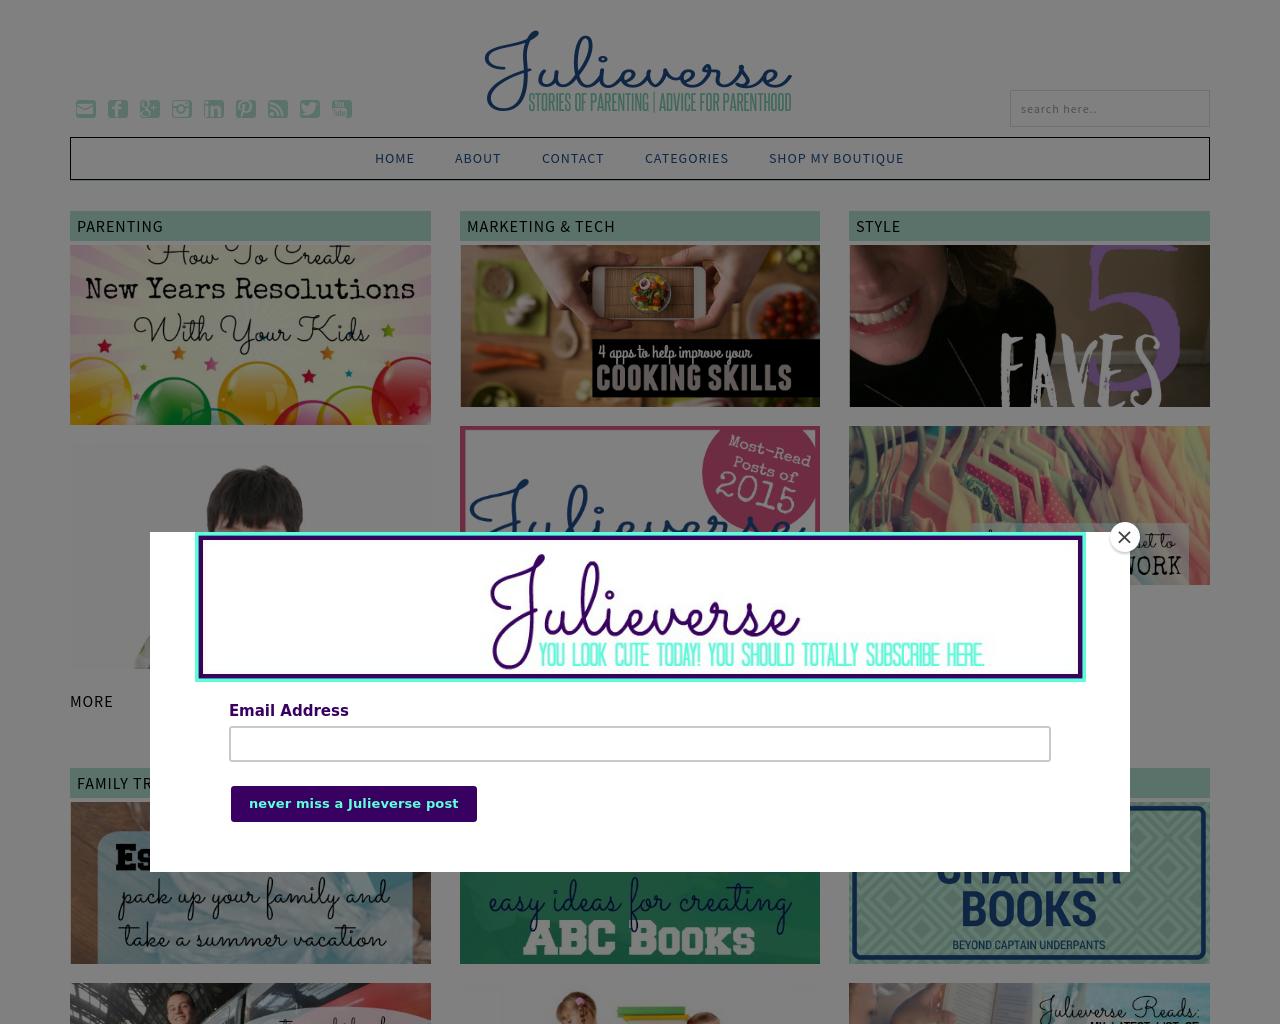 Julieverse-Advertising-Reviews-Pricing